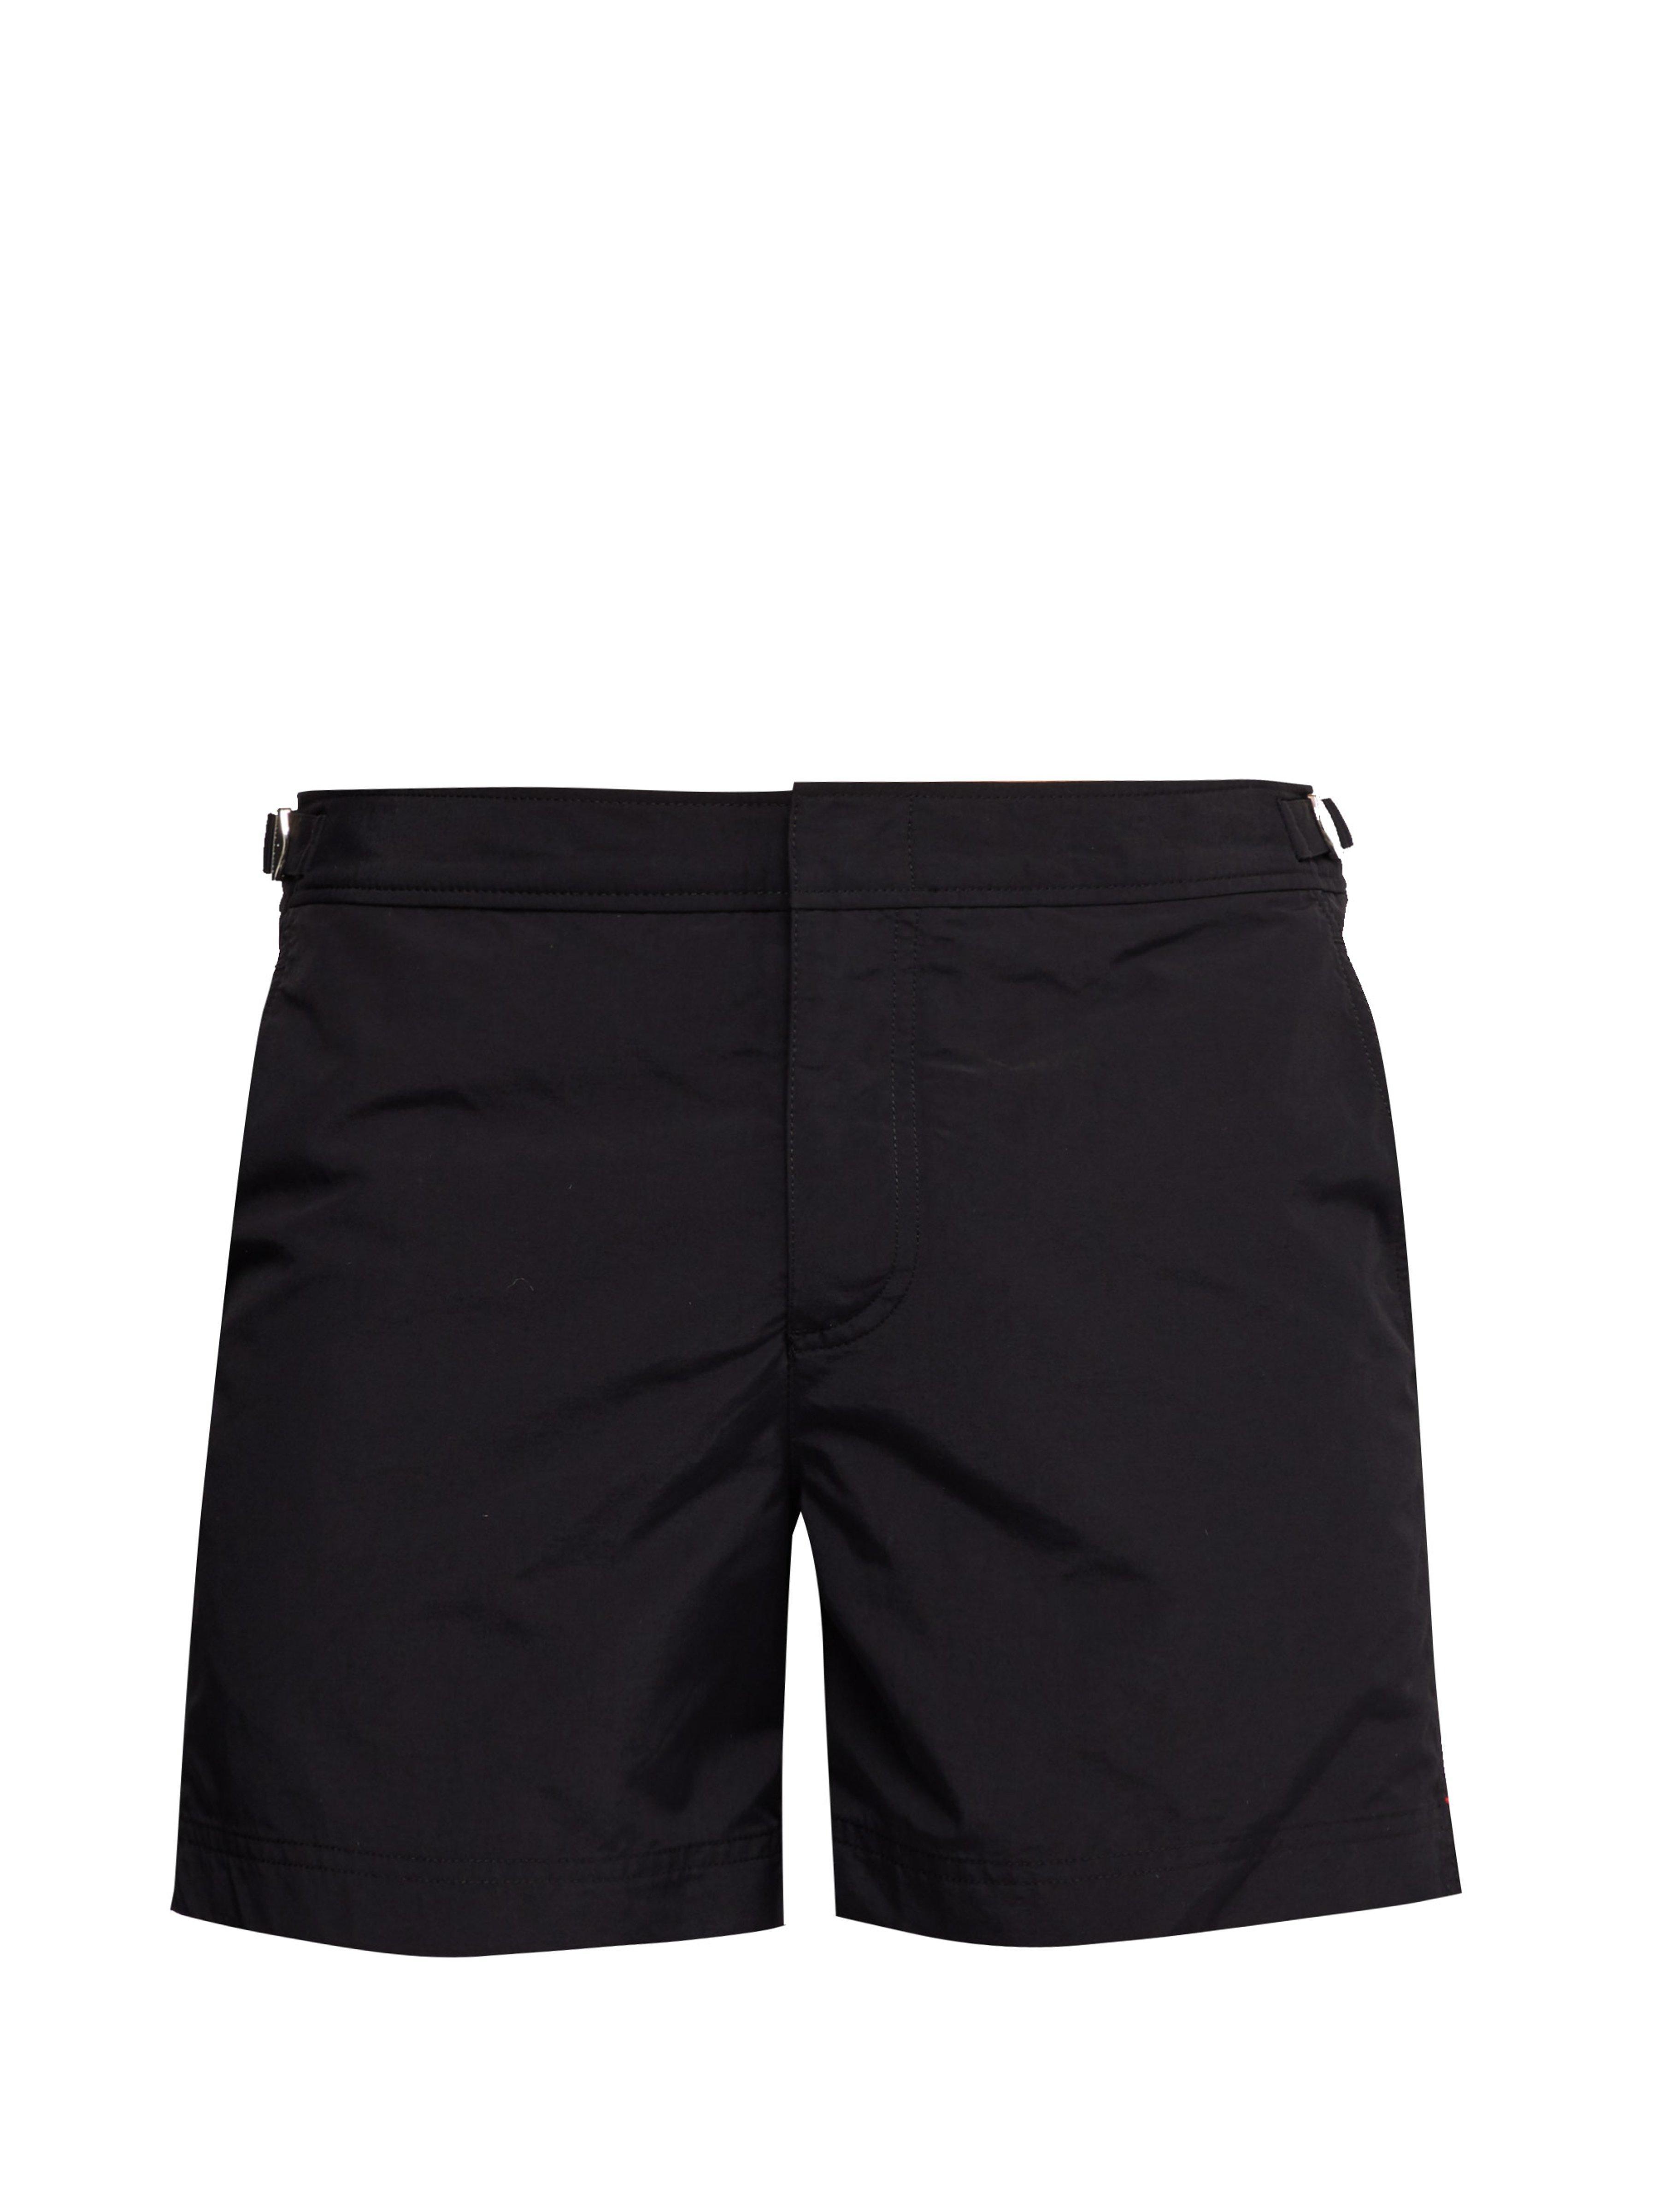 7ca70cc1f0 Orlebar Brown Setter Swim Shorts in Black for Men - Lyst